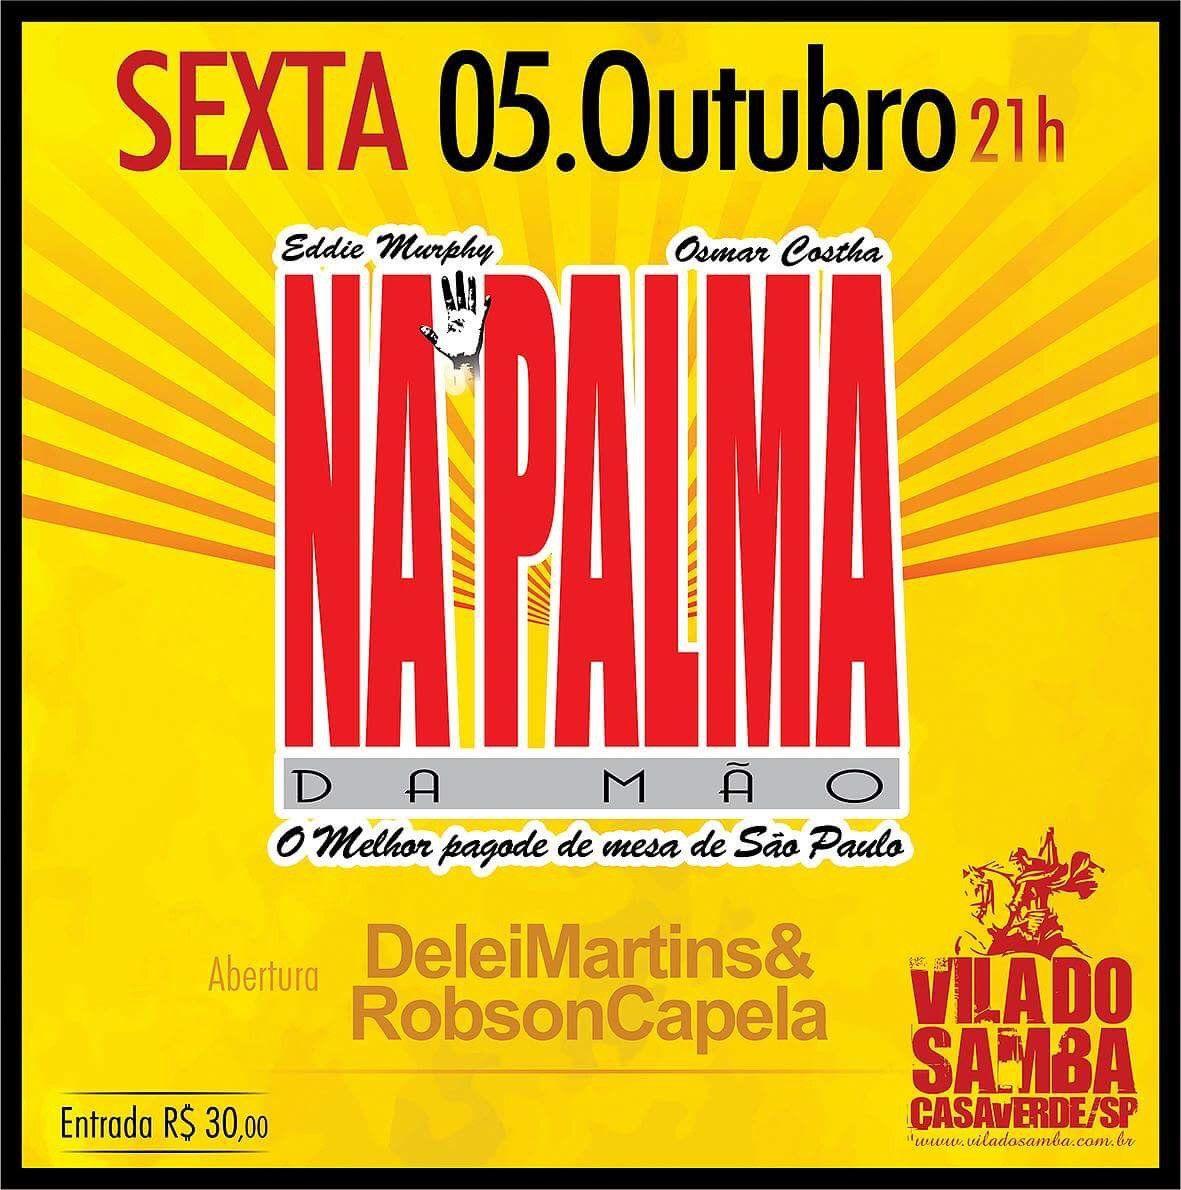 Galocantô - Vila do Samba - 05/10/18 - São Paulo - SP